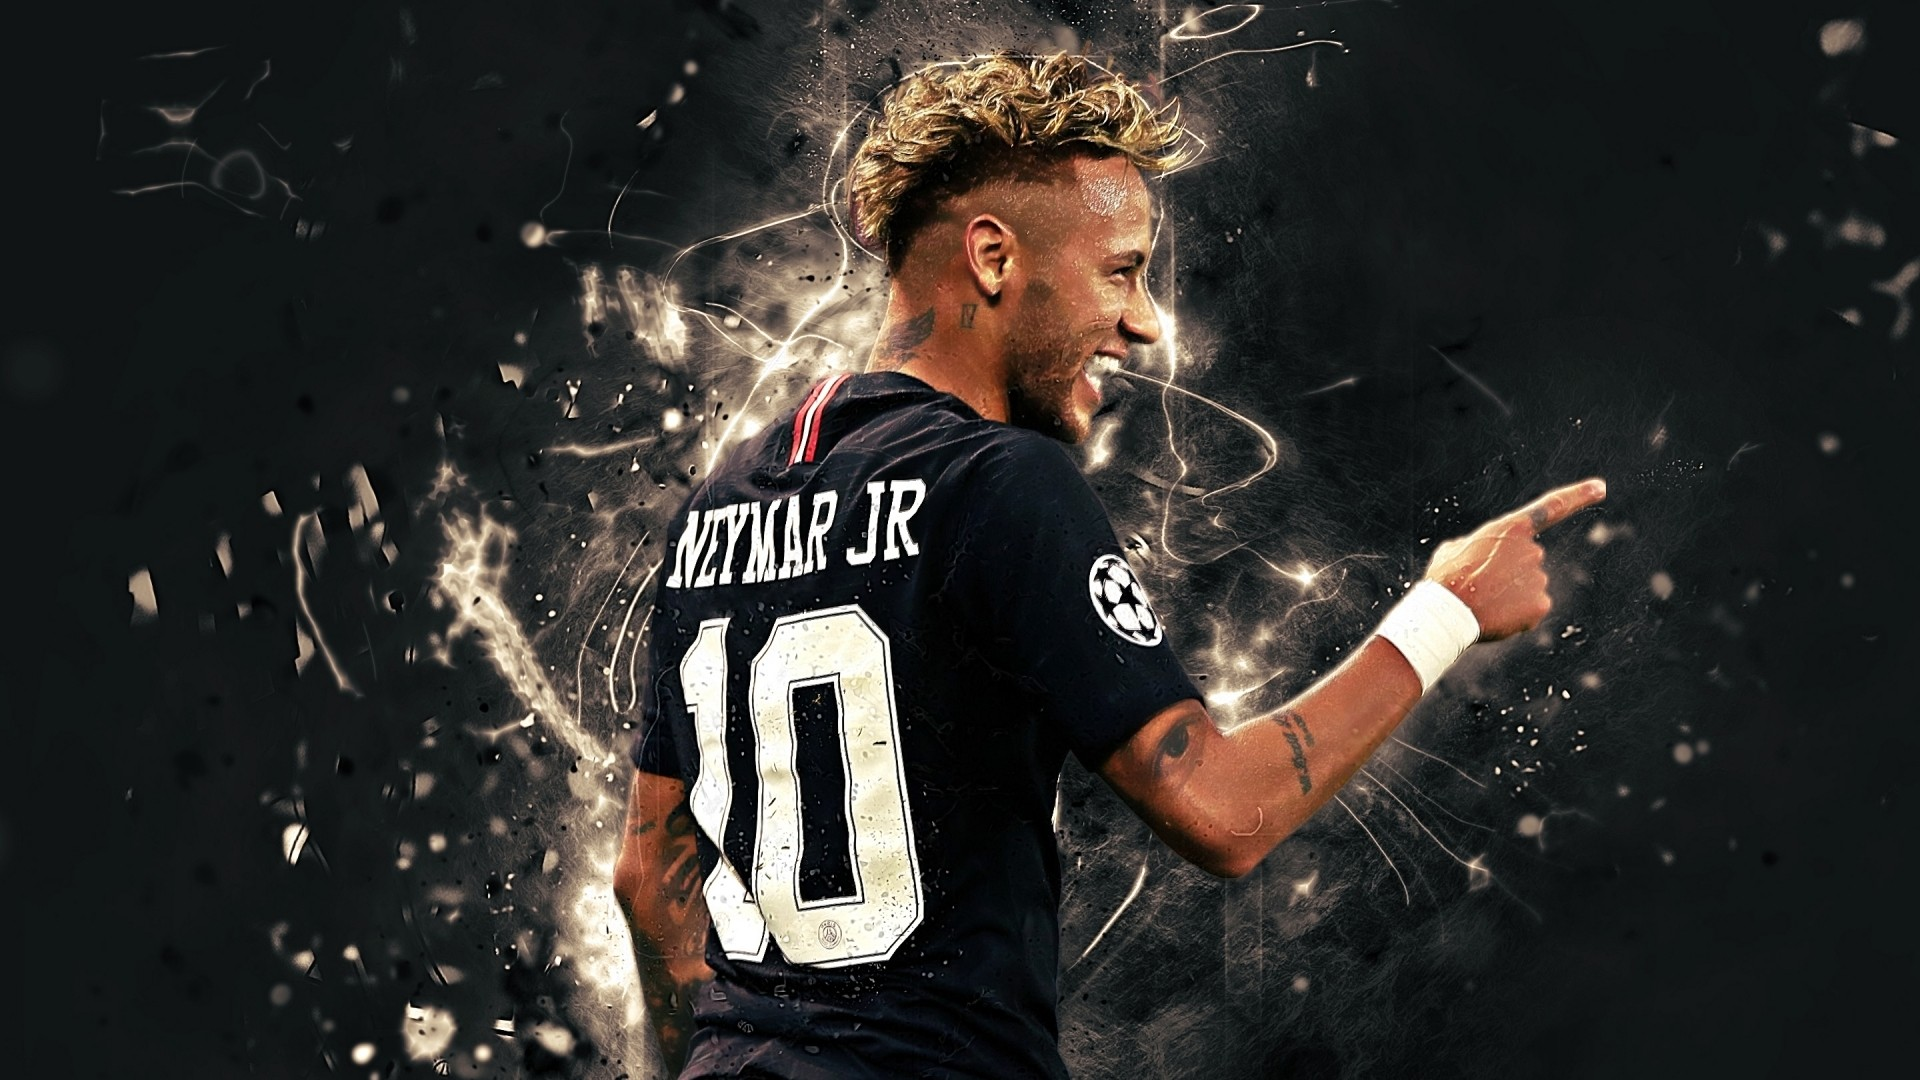 Neymar Jr Wallpaper and Background